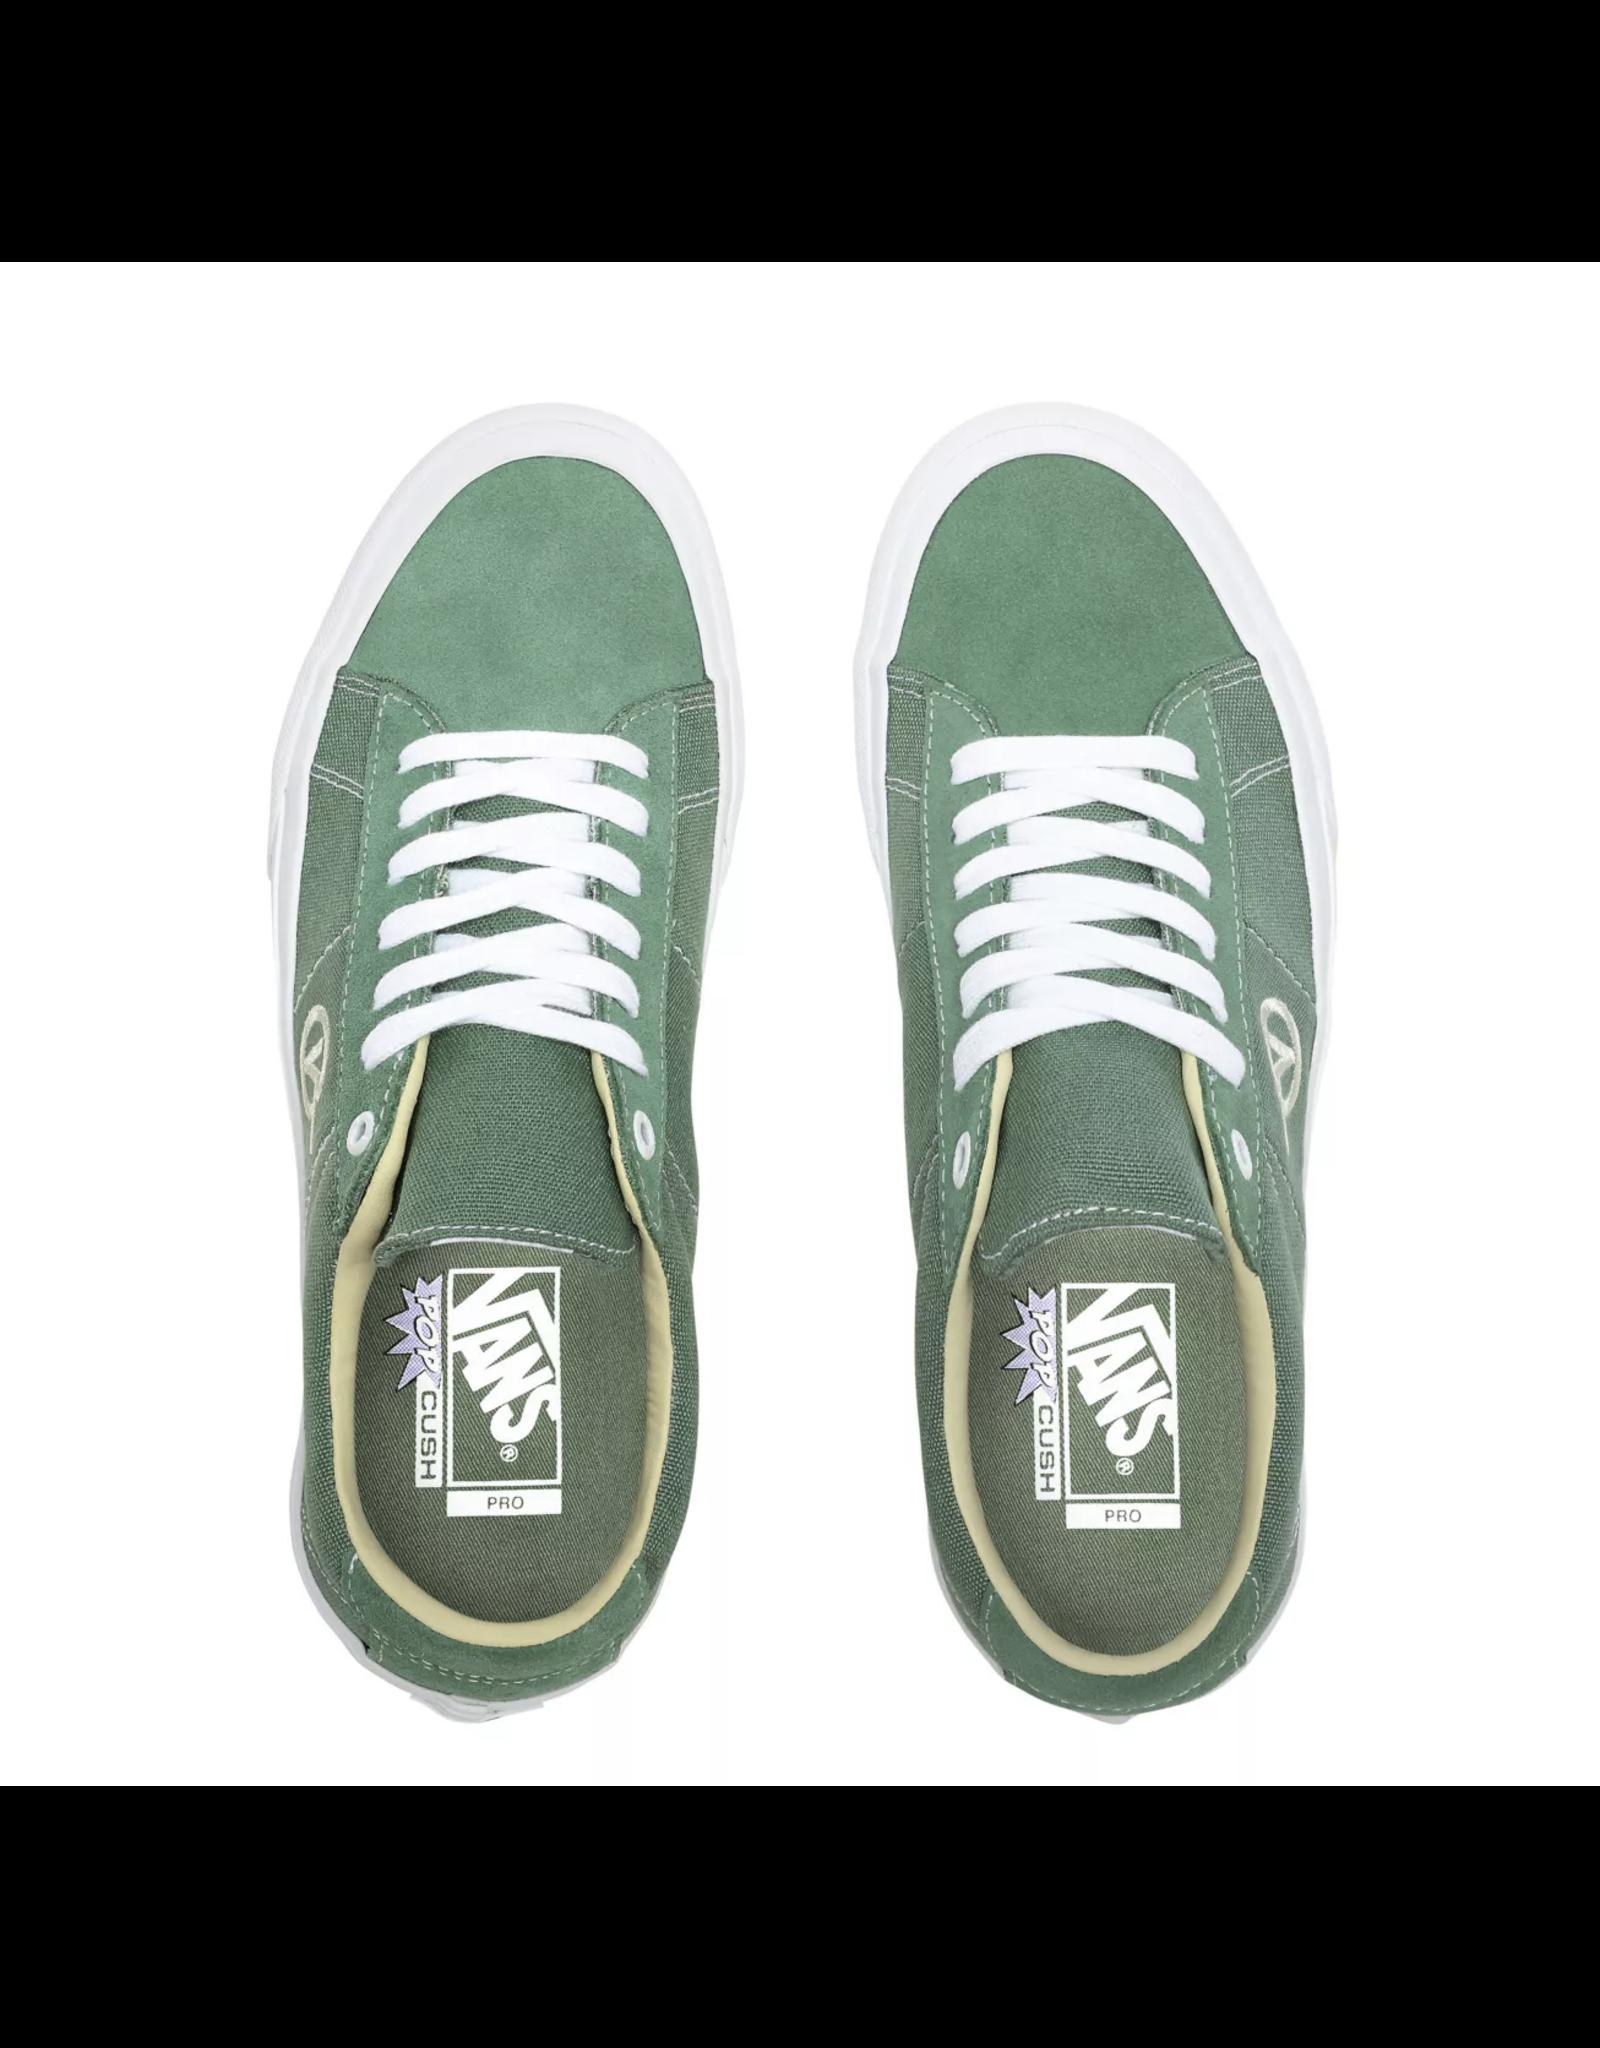 Vans Saddle Sid Pro Shoes - Hedge Green